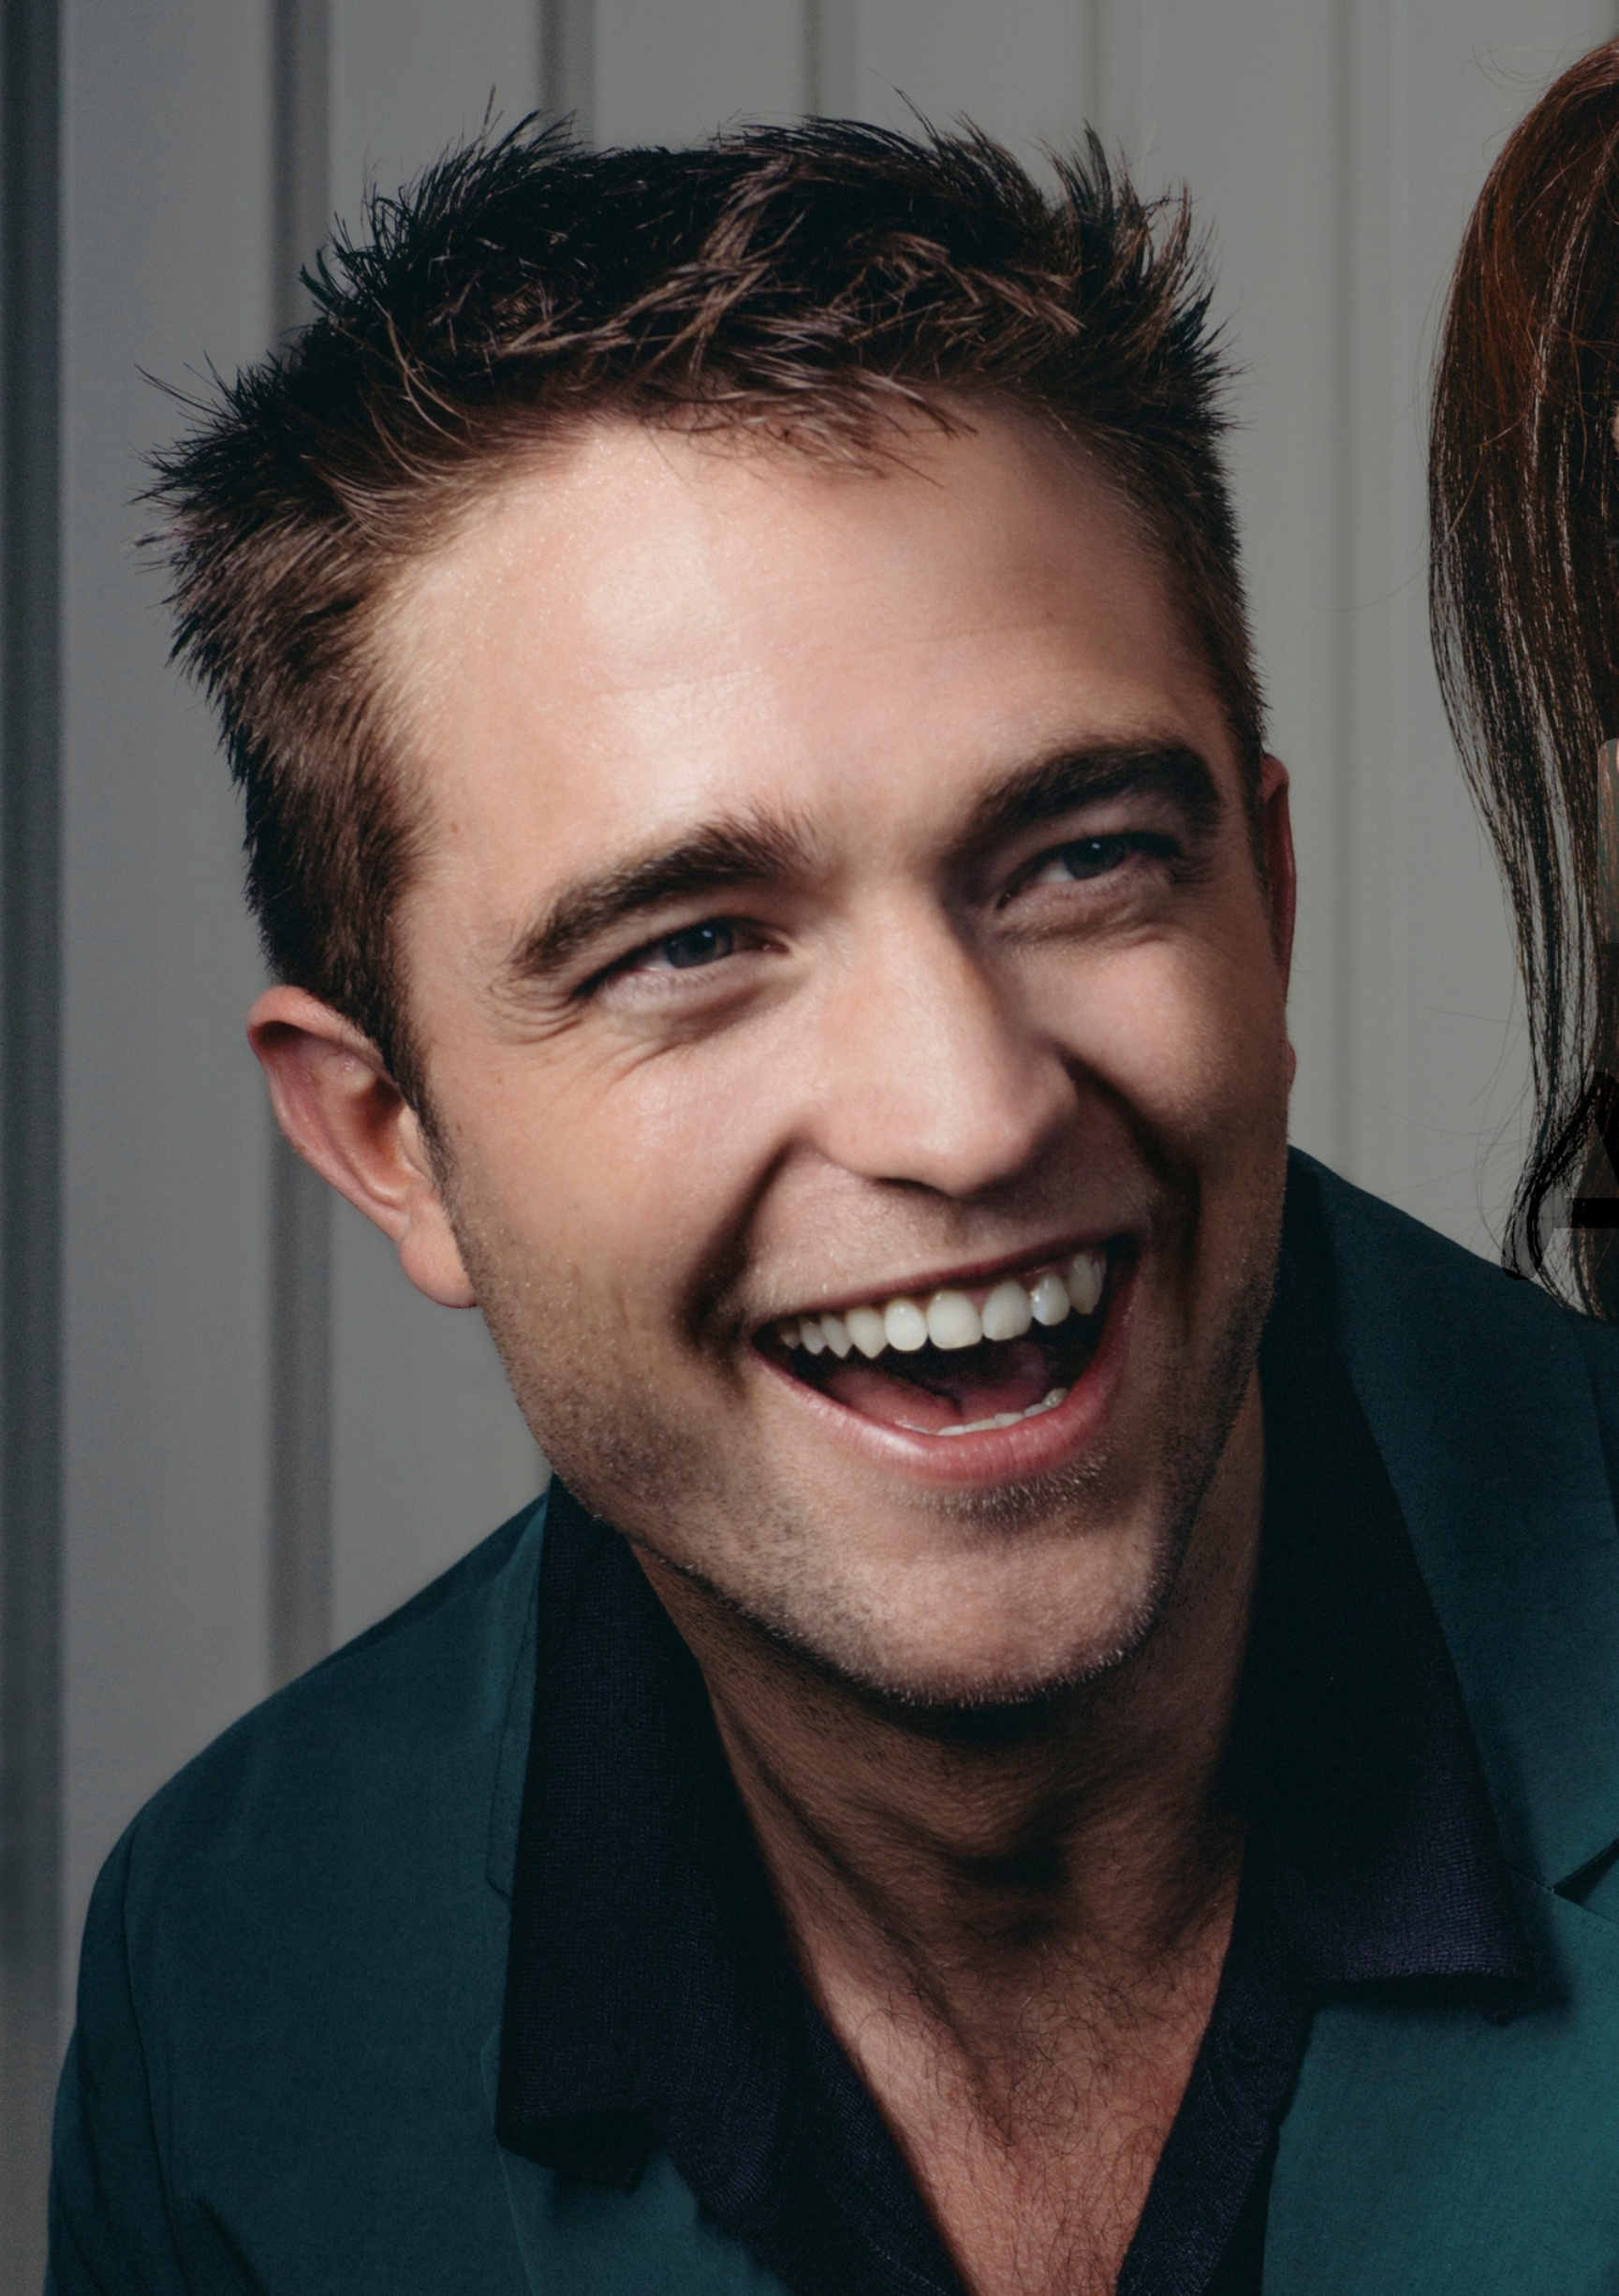 Robert Pattinson: Manc... Robert Pattinson